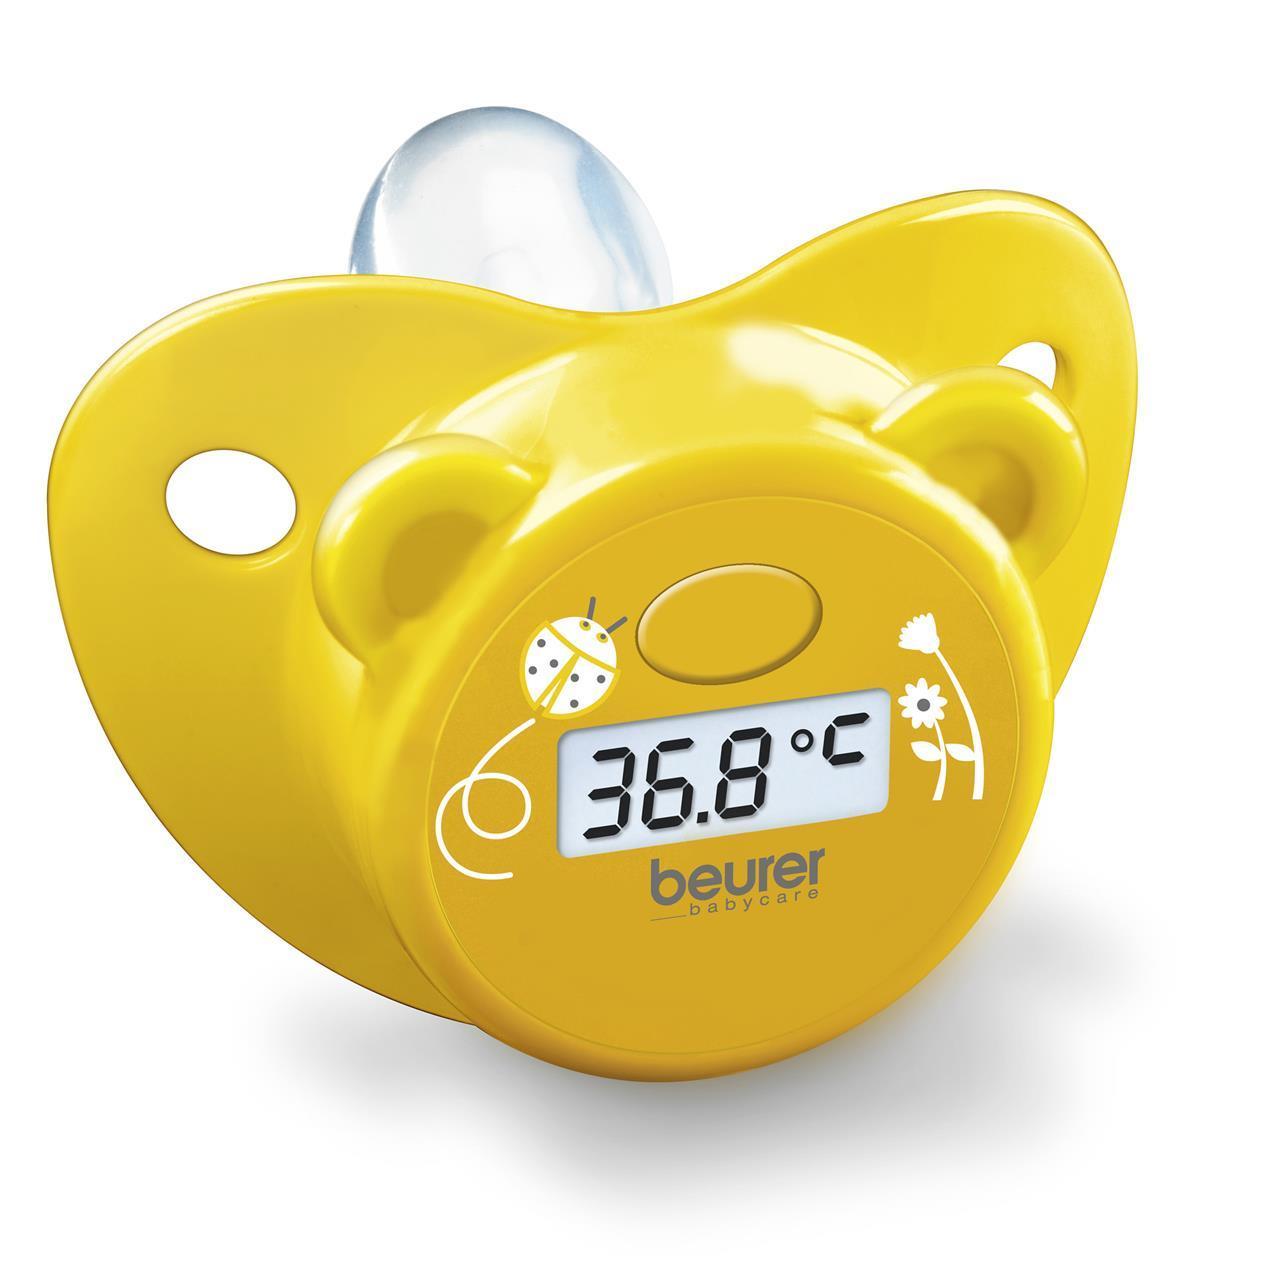 Napptermometer